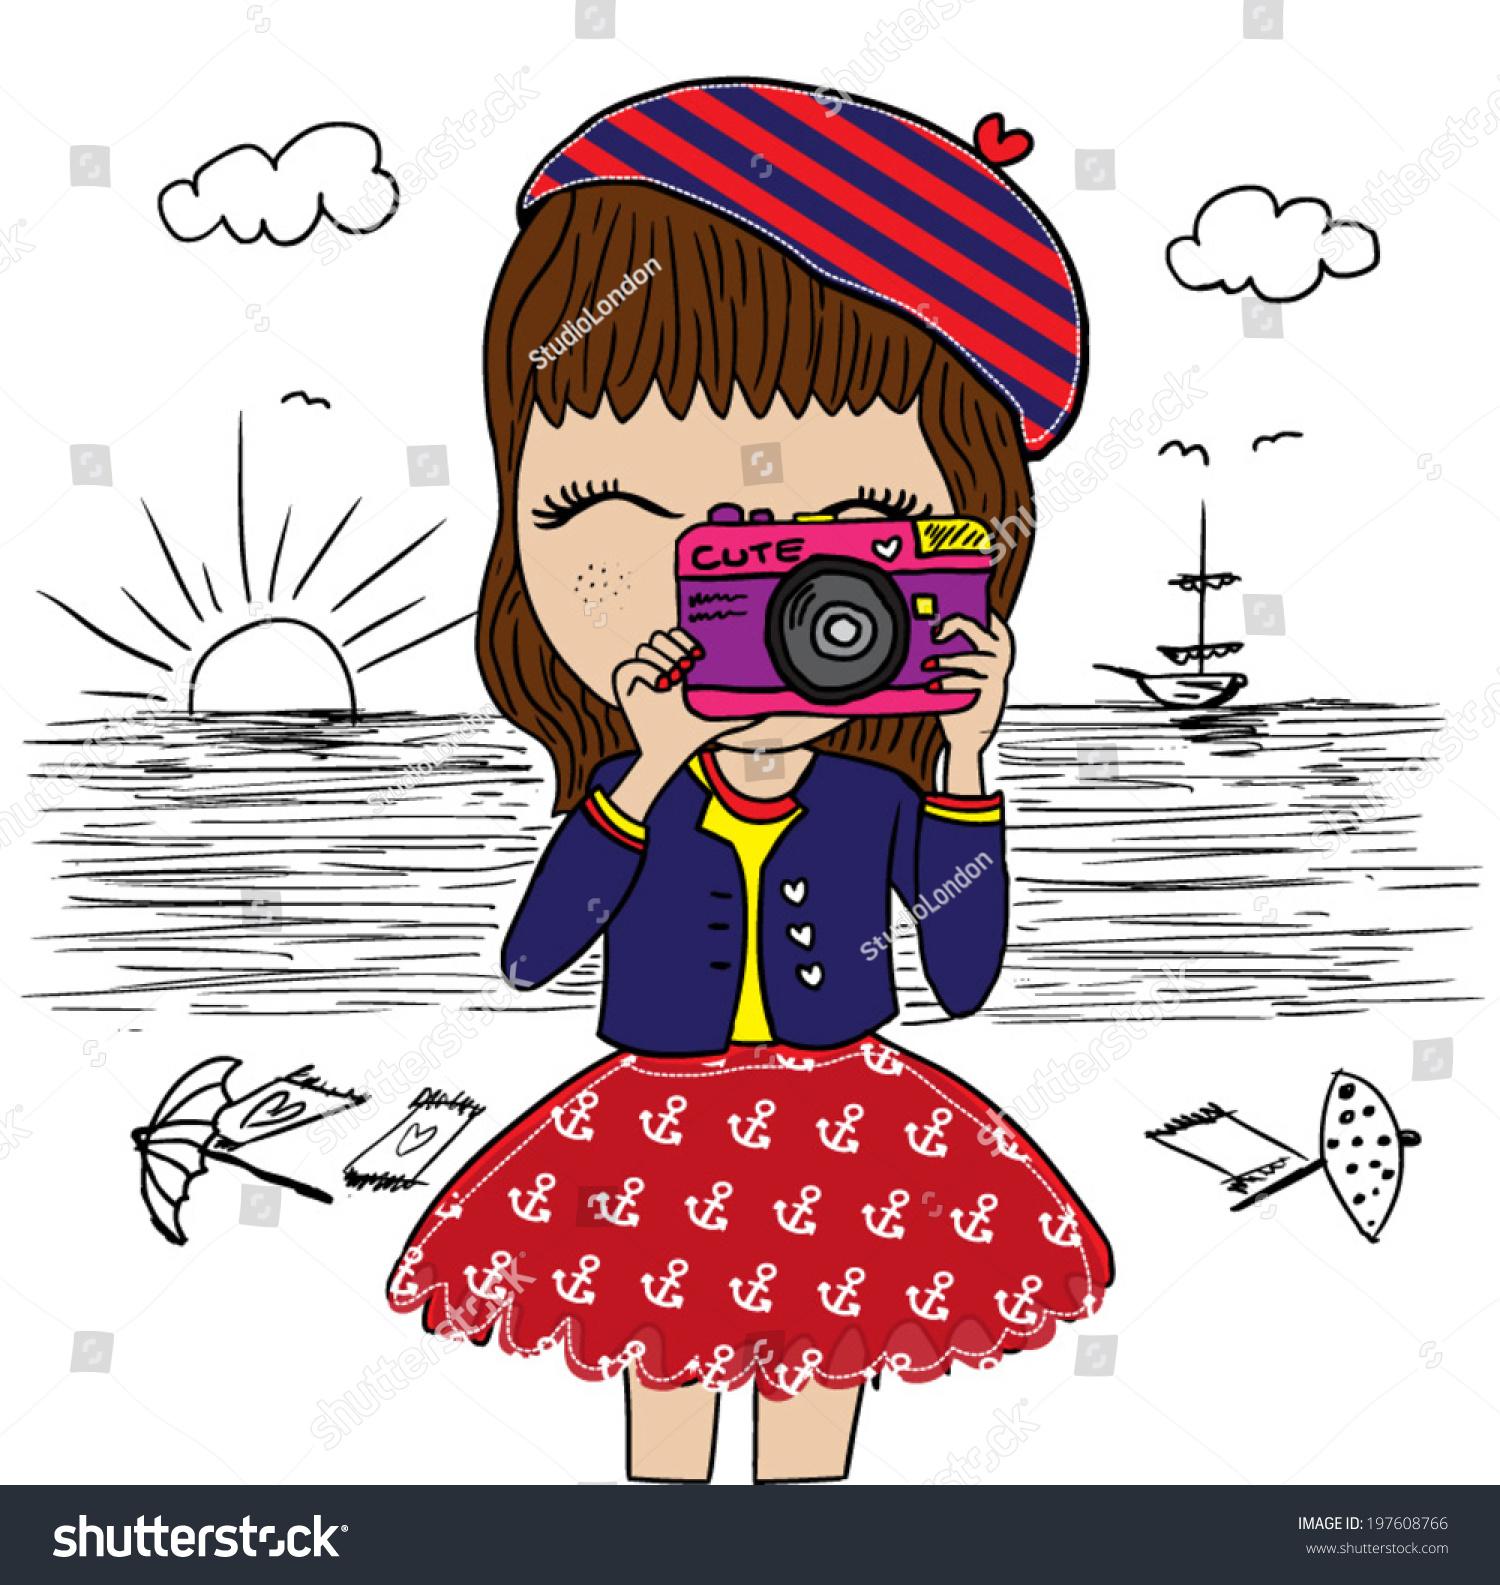 Cute Girl Marinethemed Illustration Girl Graphic Stock ...